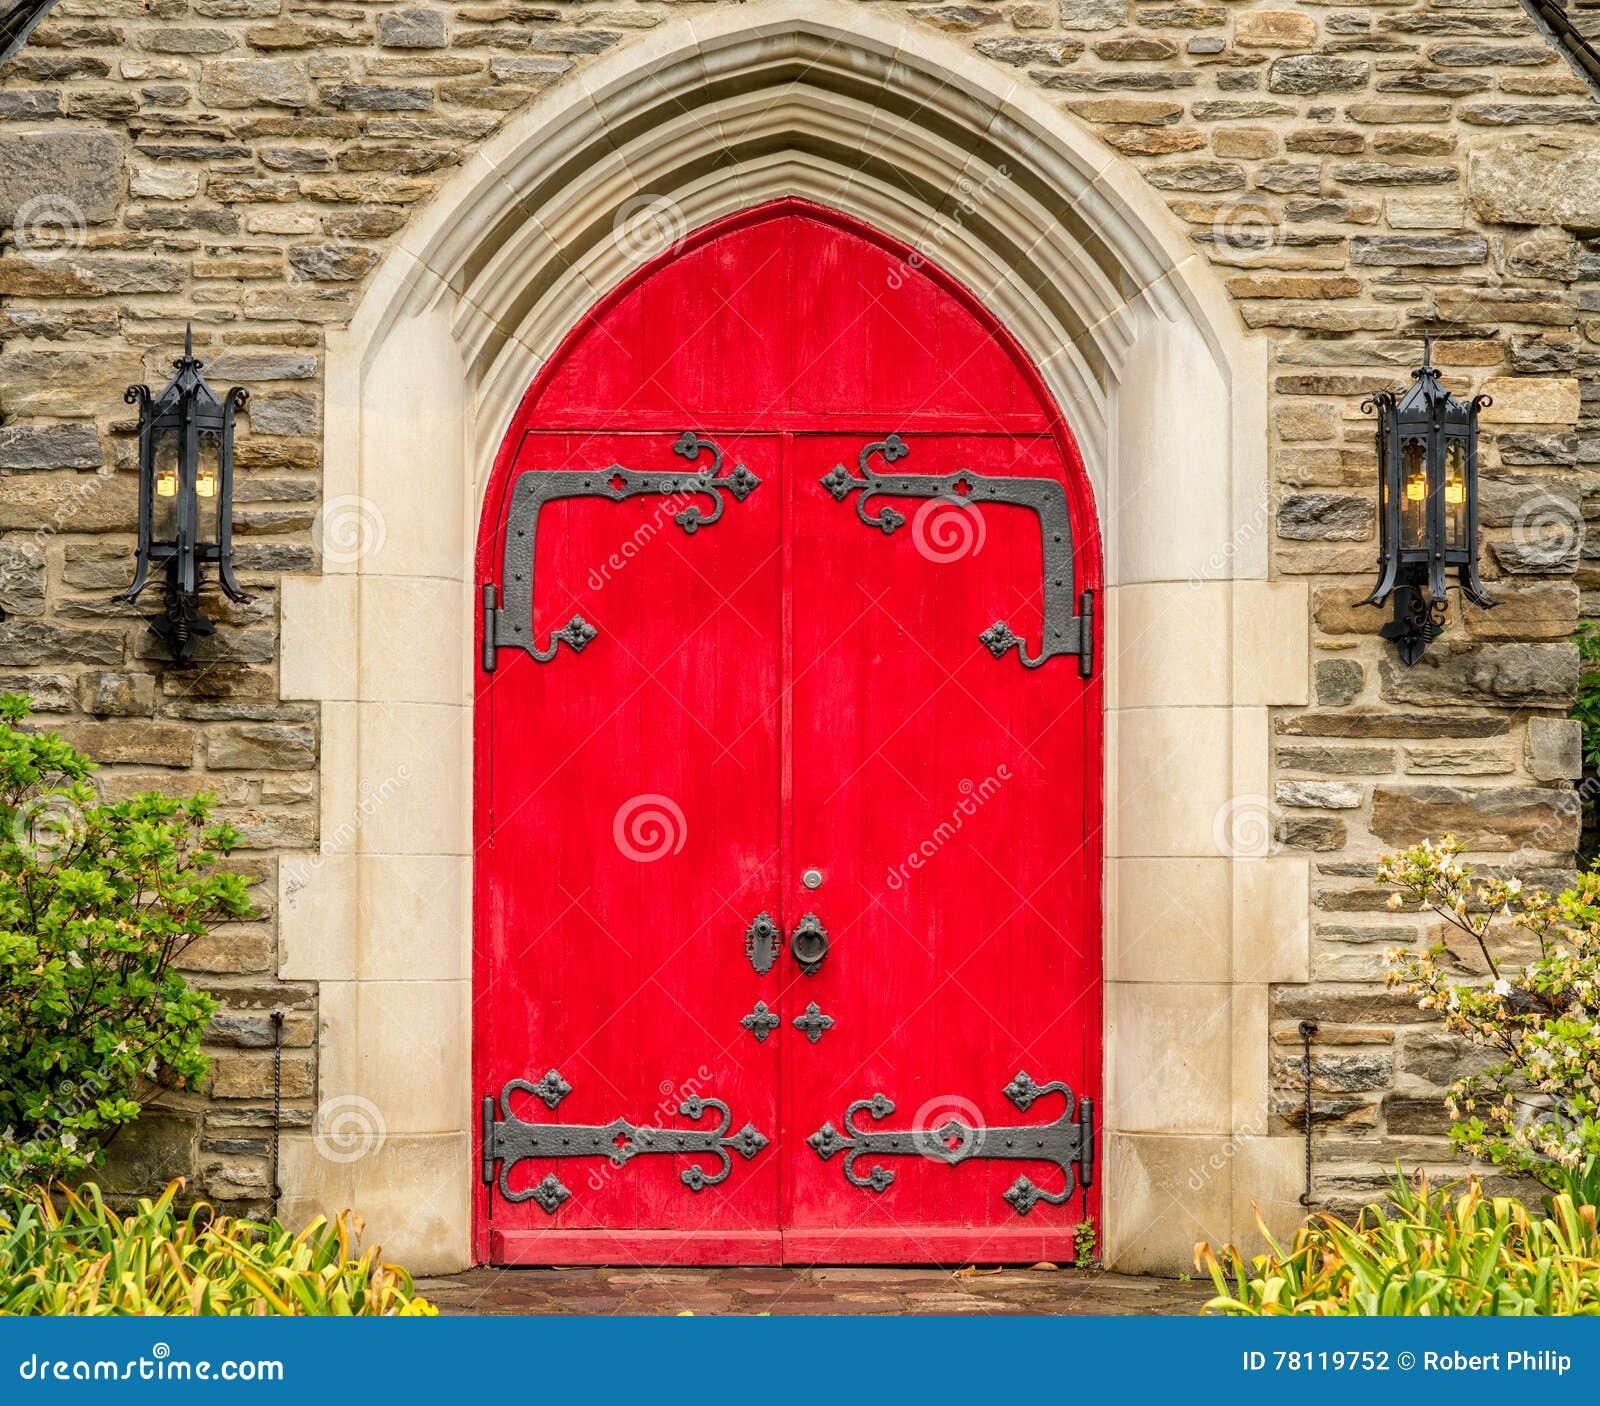 Royalty-Free Stock Photo & Red Rustic Ornate Church Doors Gatlinburg Tennessee Stock Photo ...